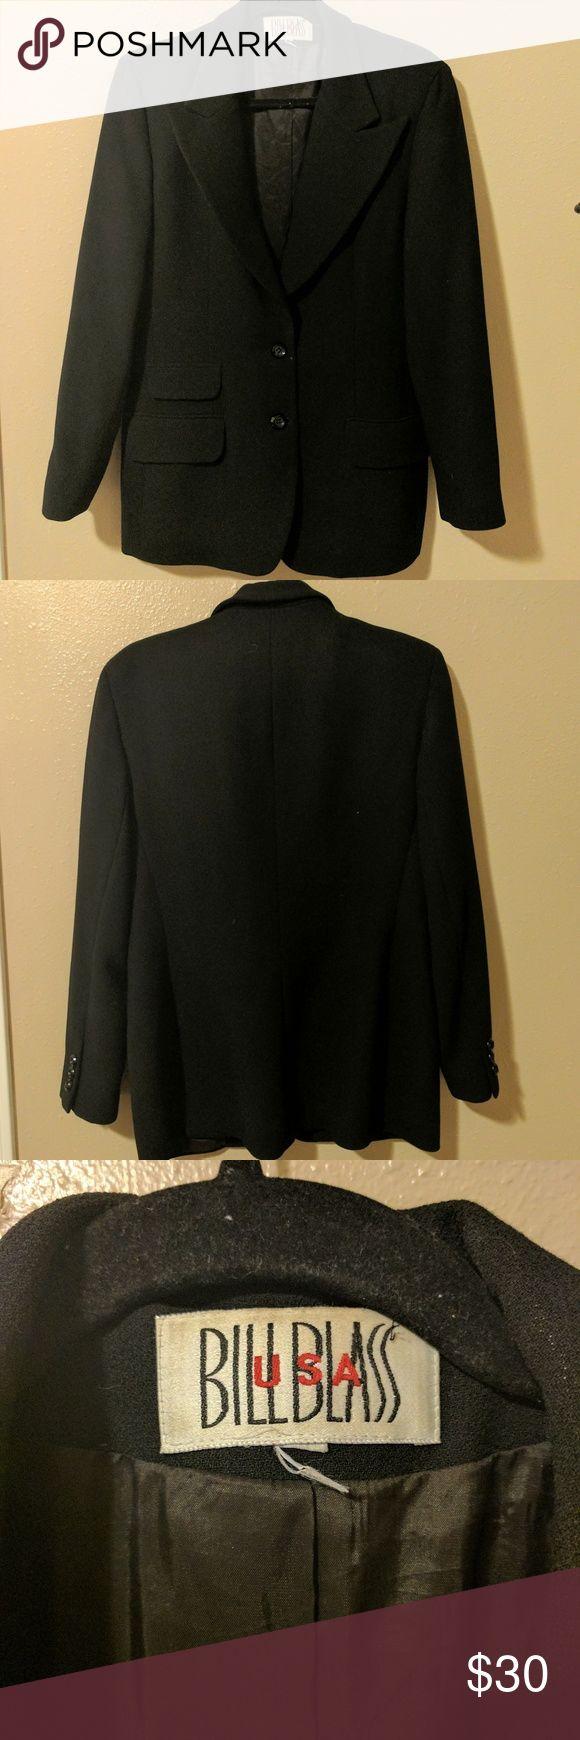 Bill Blass Black Suit Jacket Stylish Women's black suit jacket from Bill Blass. In excellent condition. Price is firm. bill blass Jackets & Coats